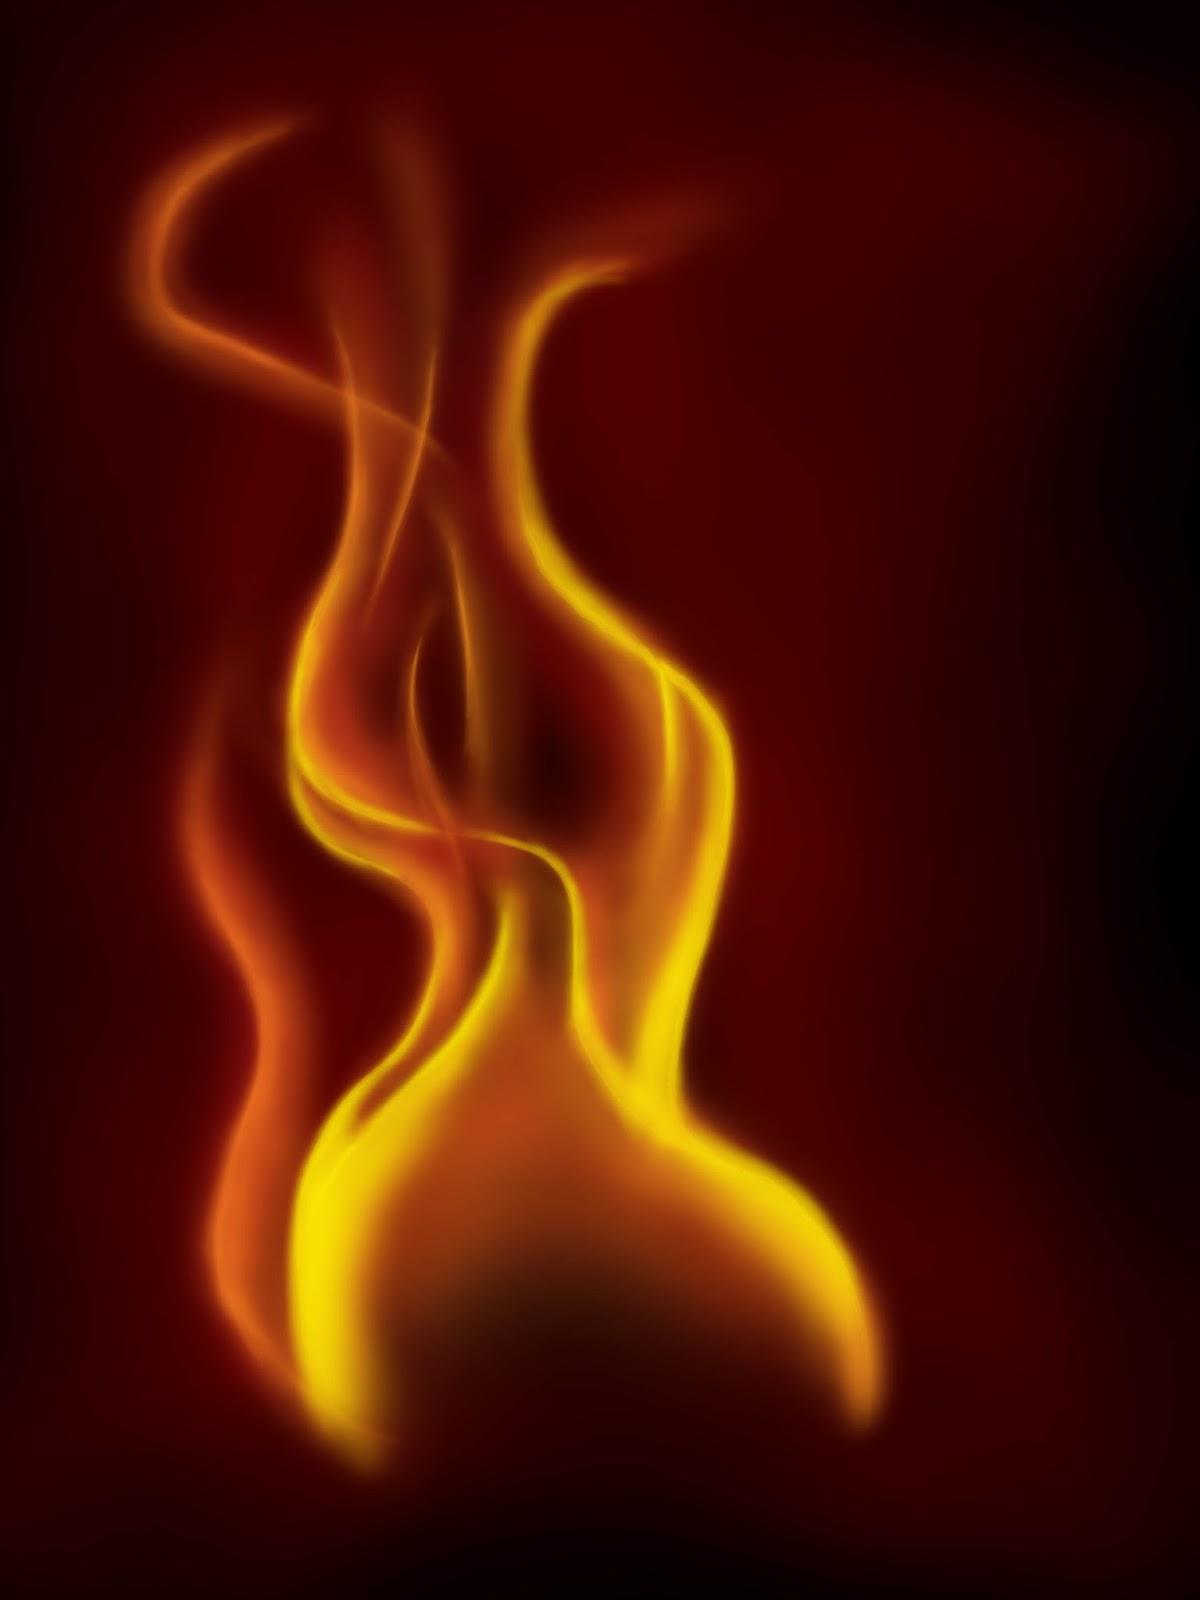 Symphony of Flames